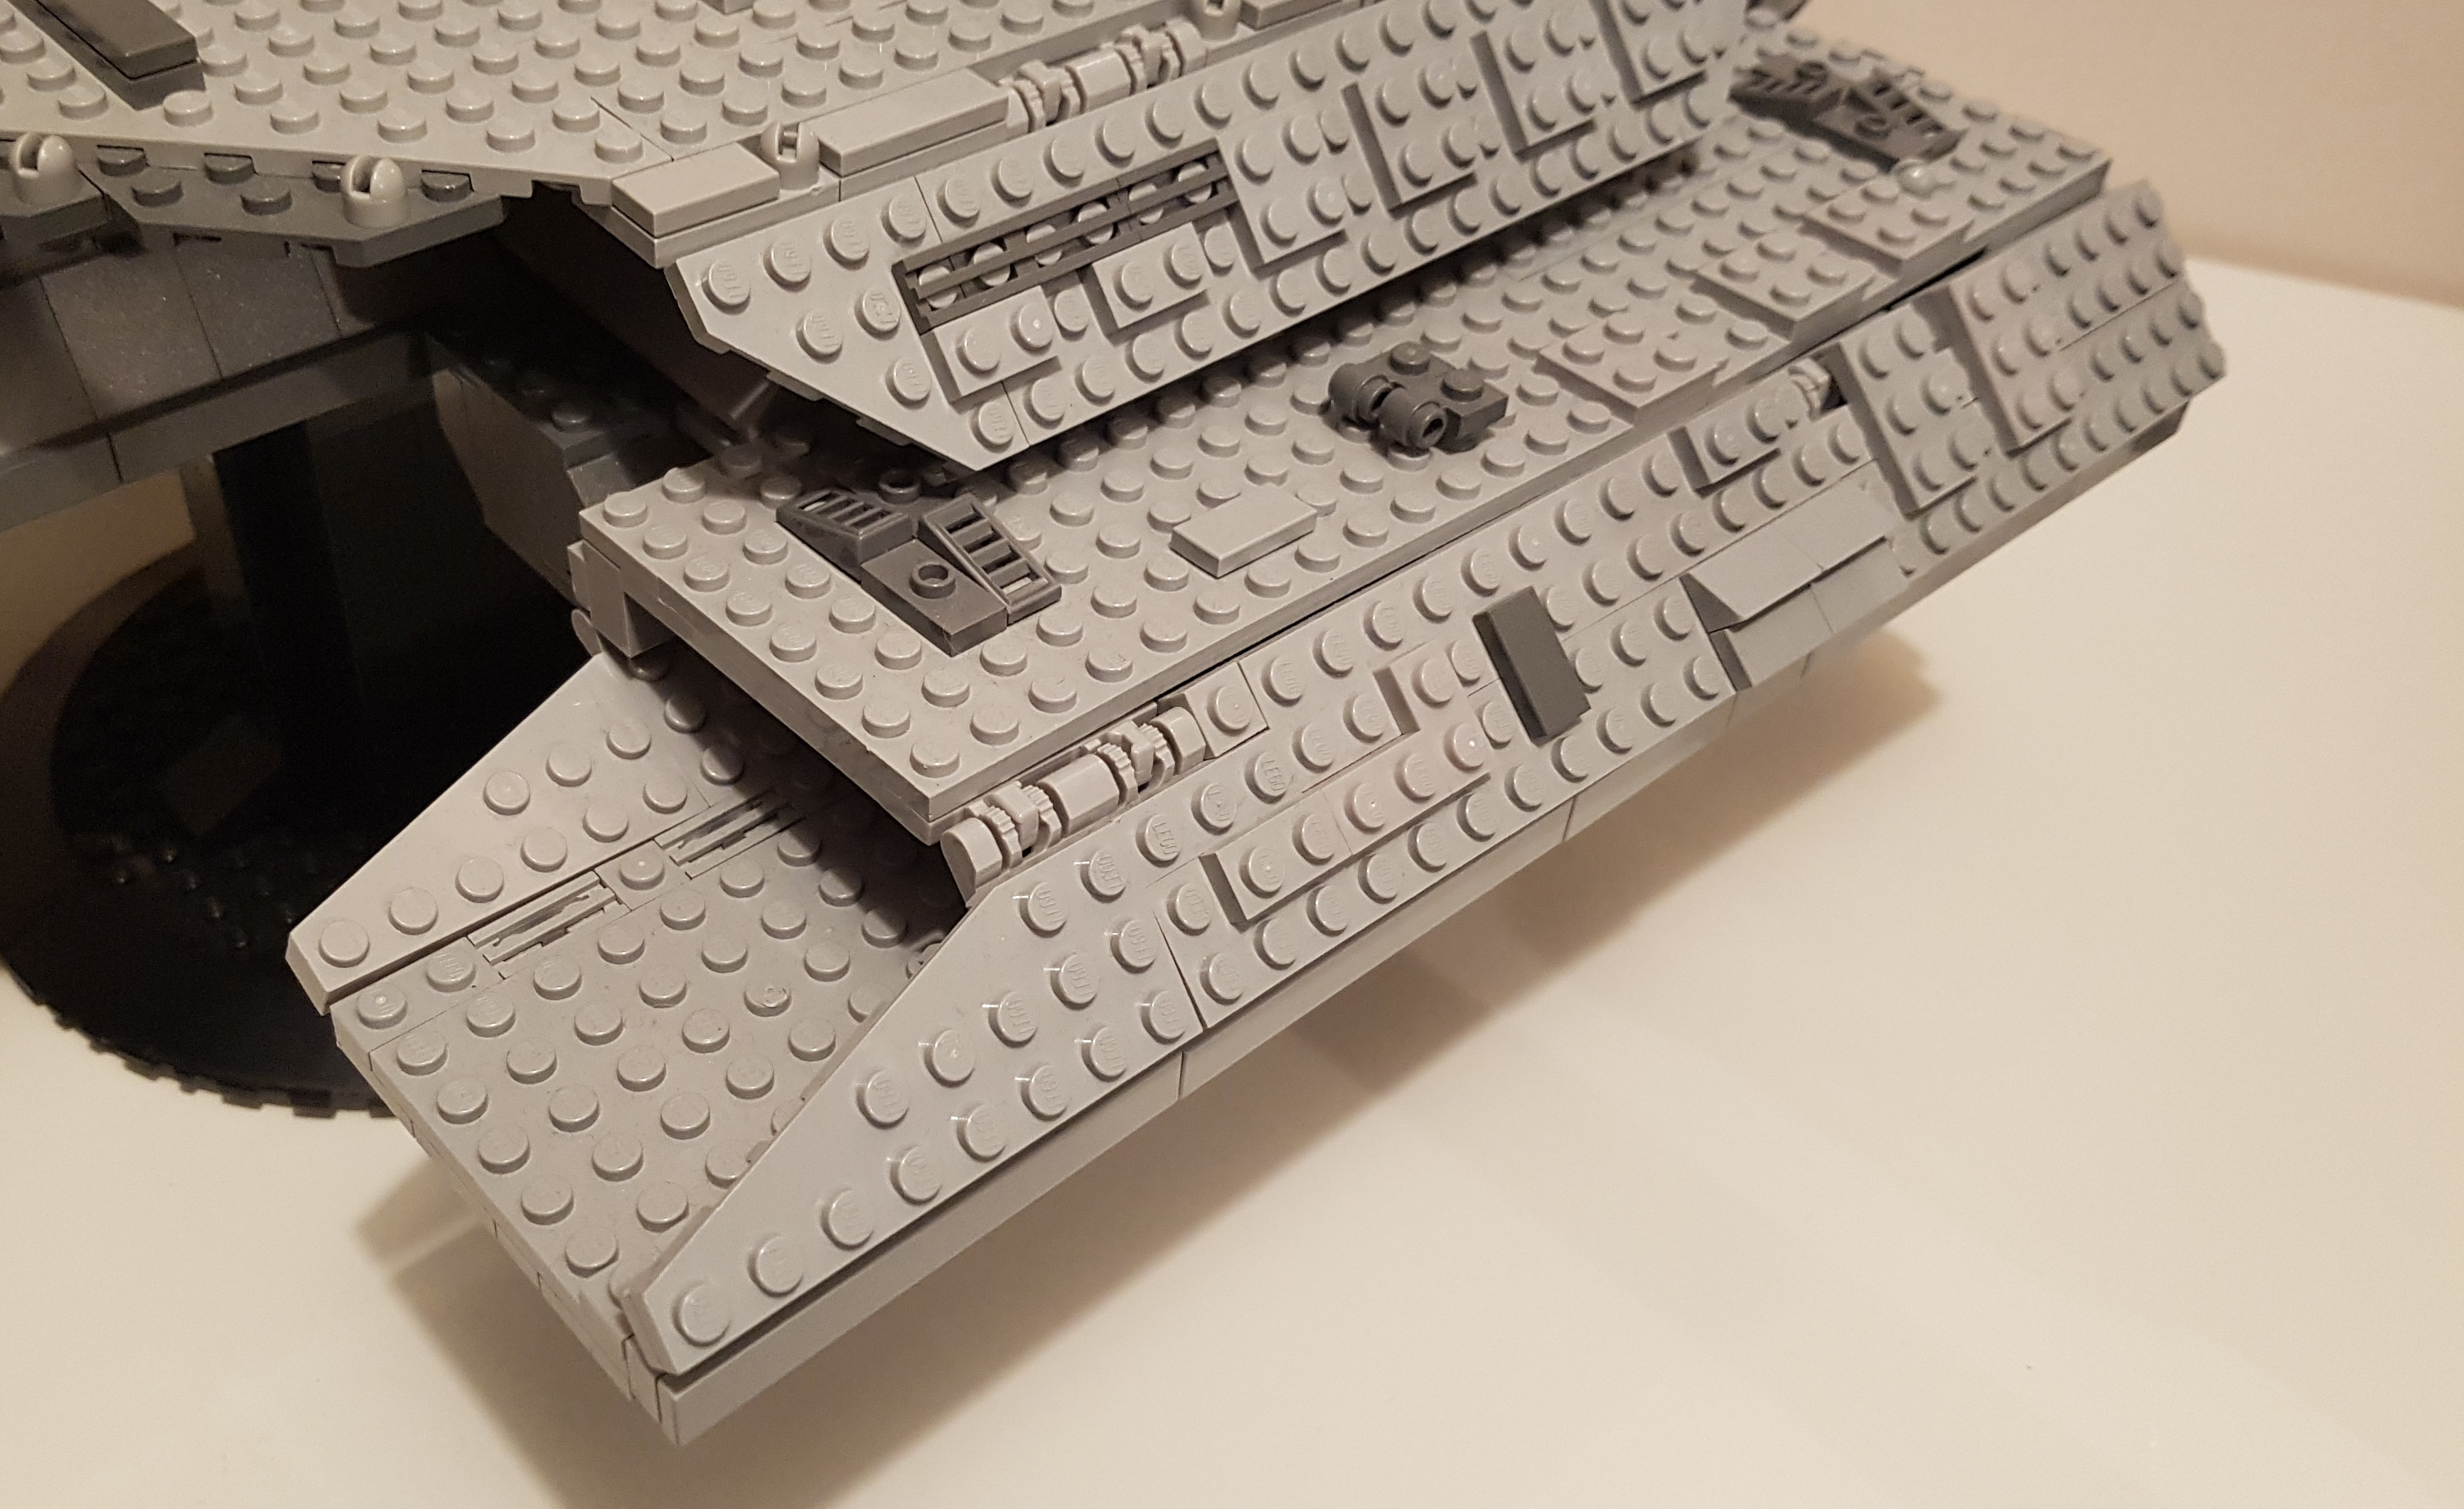 Stargate LEGO ship Daedalus hangar